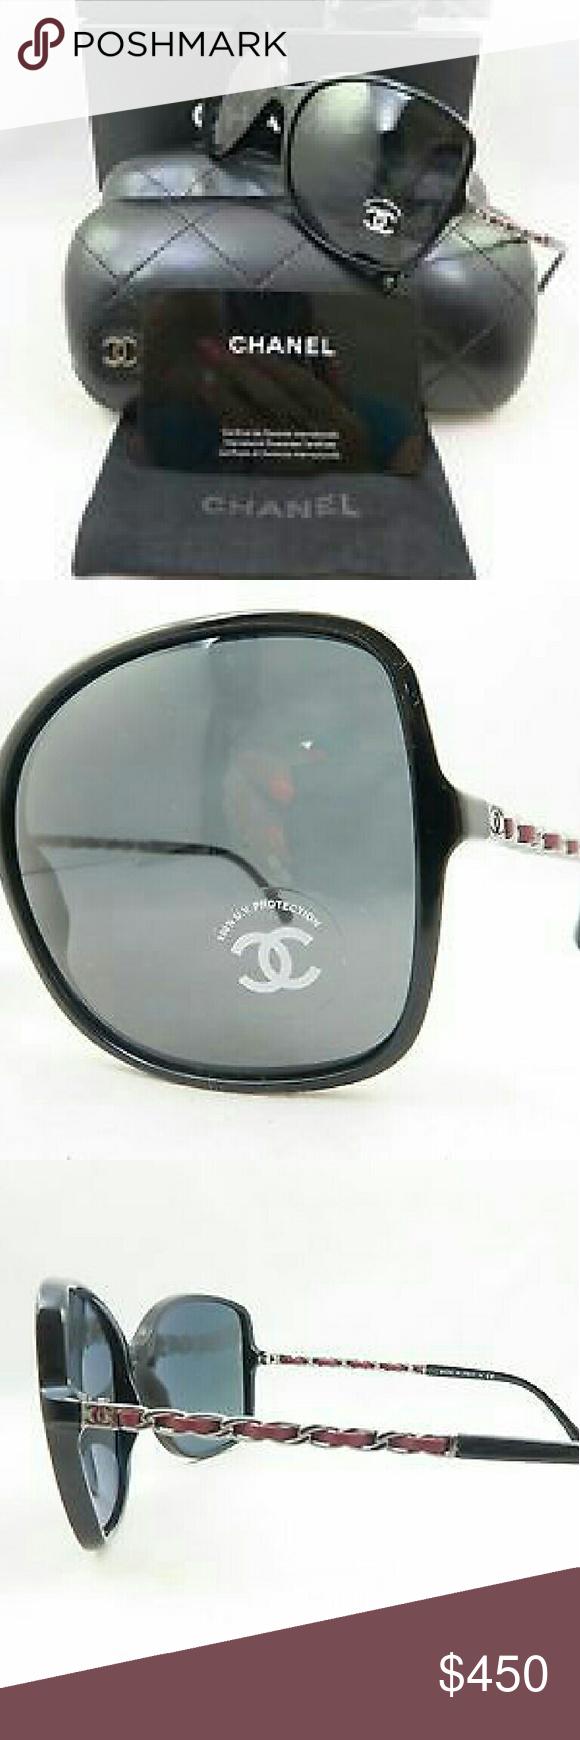 Chanel Polarized Sunglasses New and authentic  Chanel Polarized Sunglasses  Black and red frame  Includes original case, cloth and box Chanel  Accessories Glasses